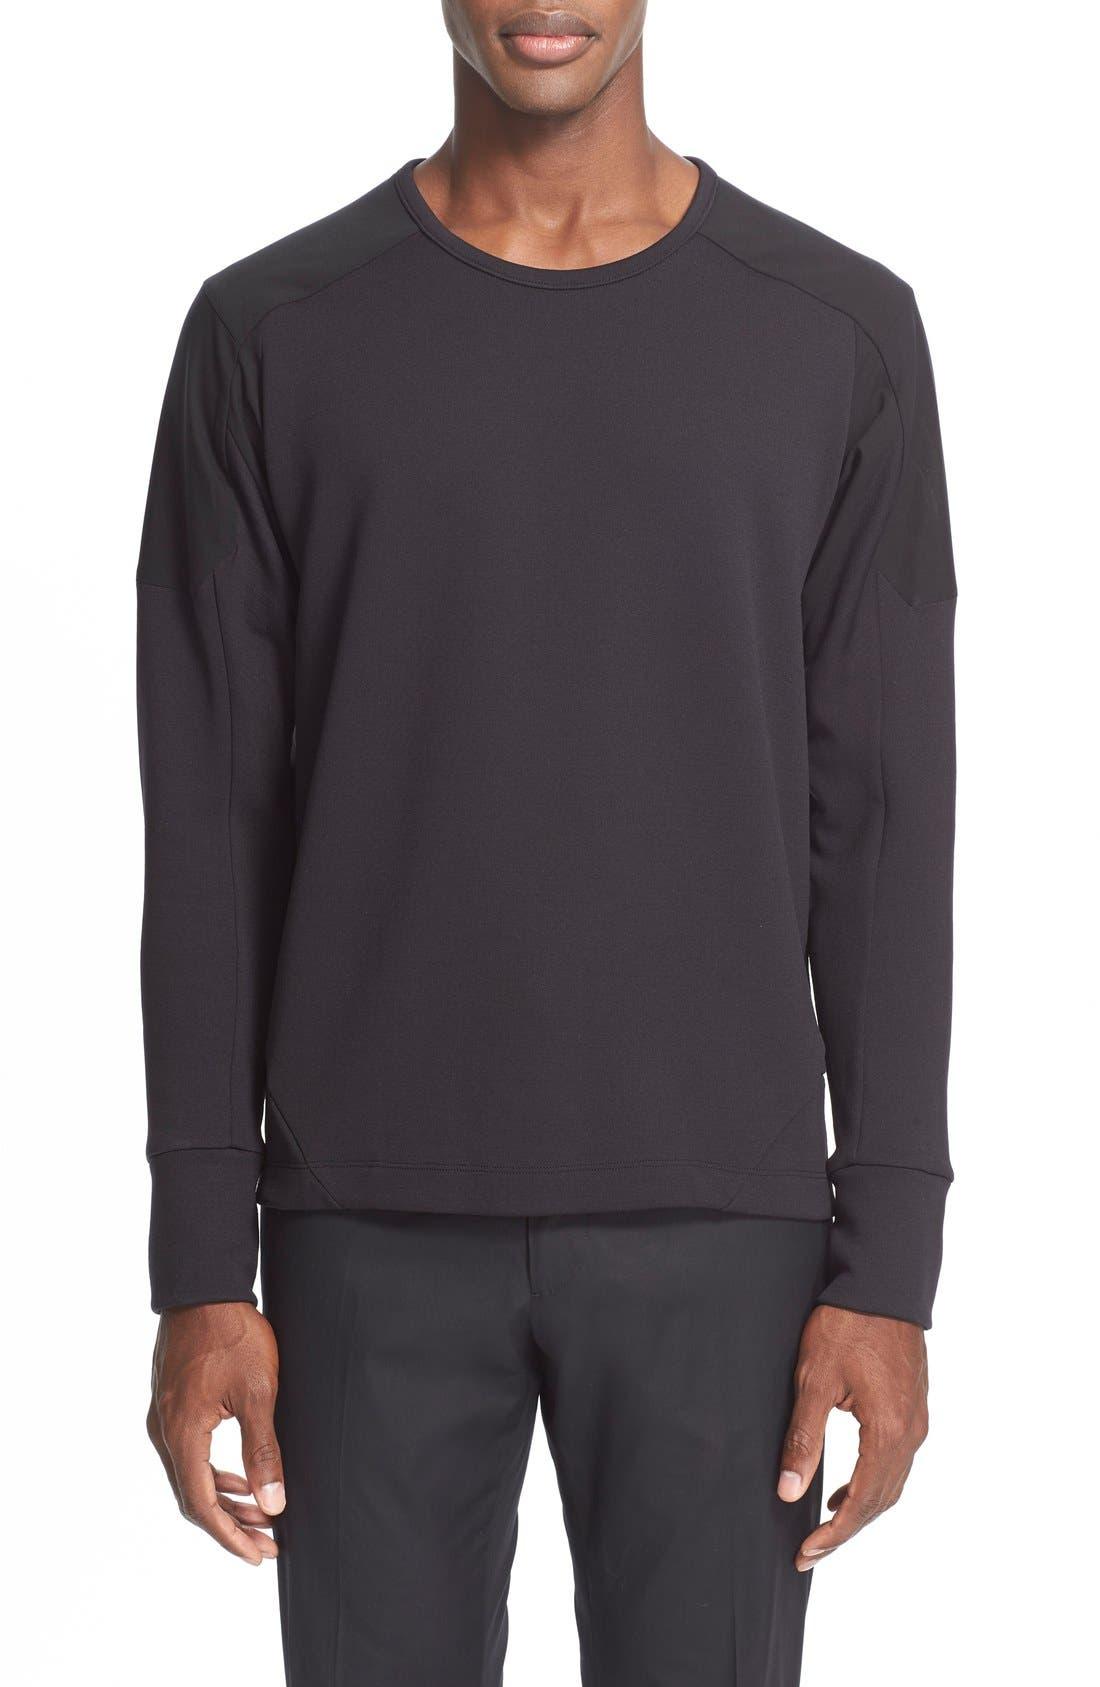 Arc'teryxVeilance'Graph' Sweater,                             Main thumbnail 1, color,                             001